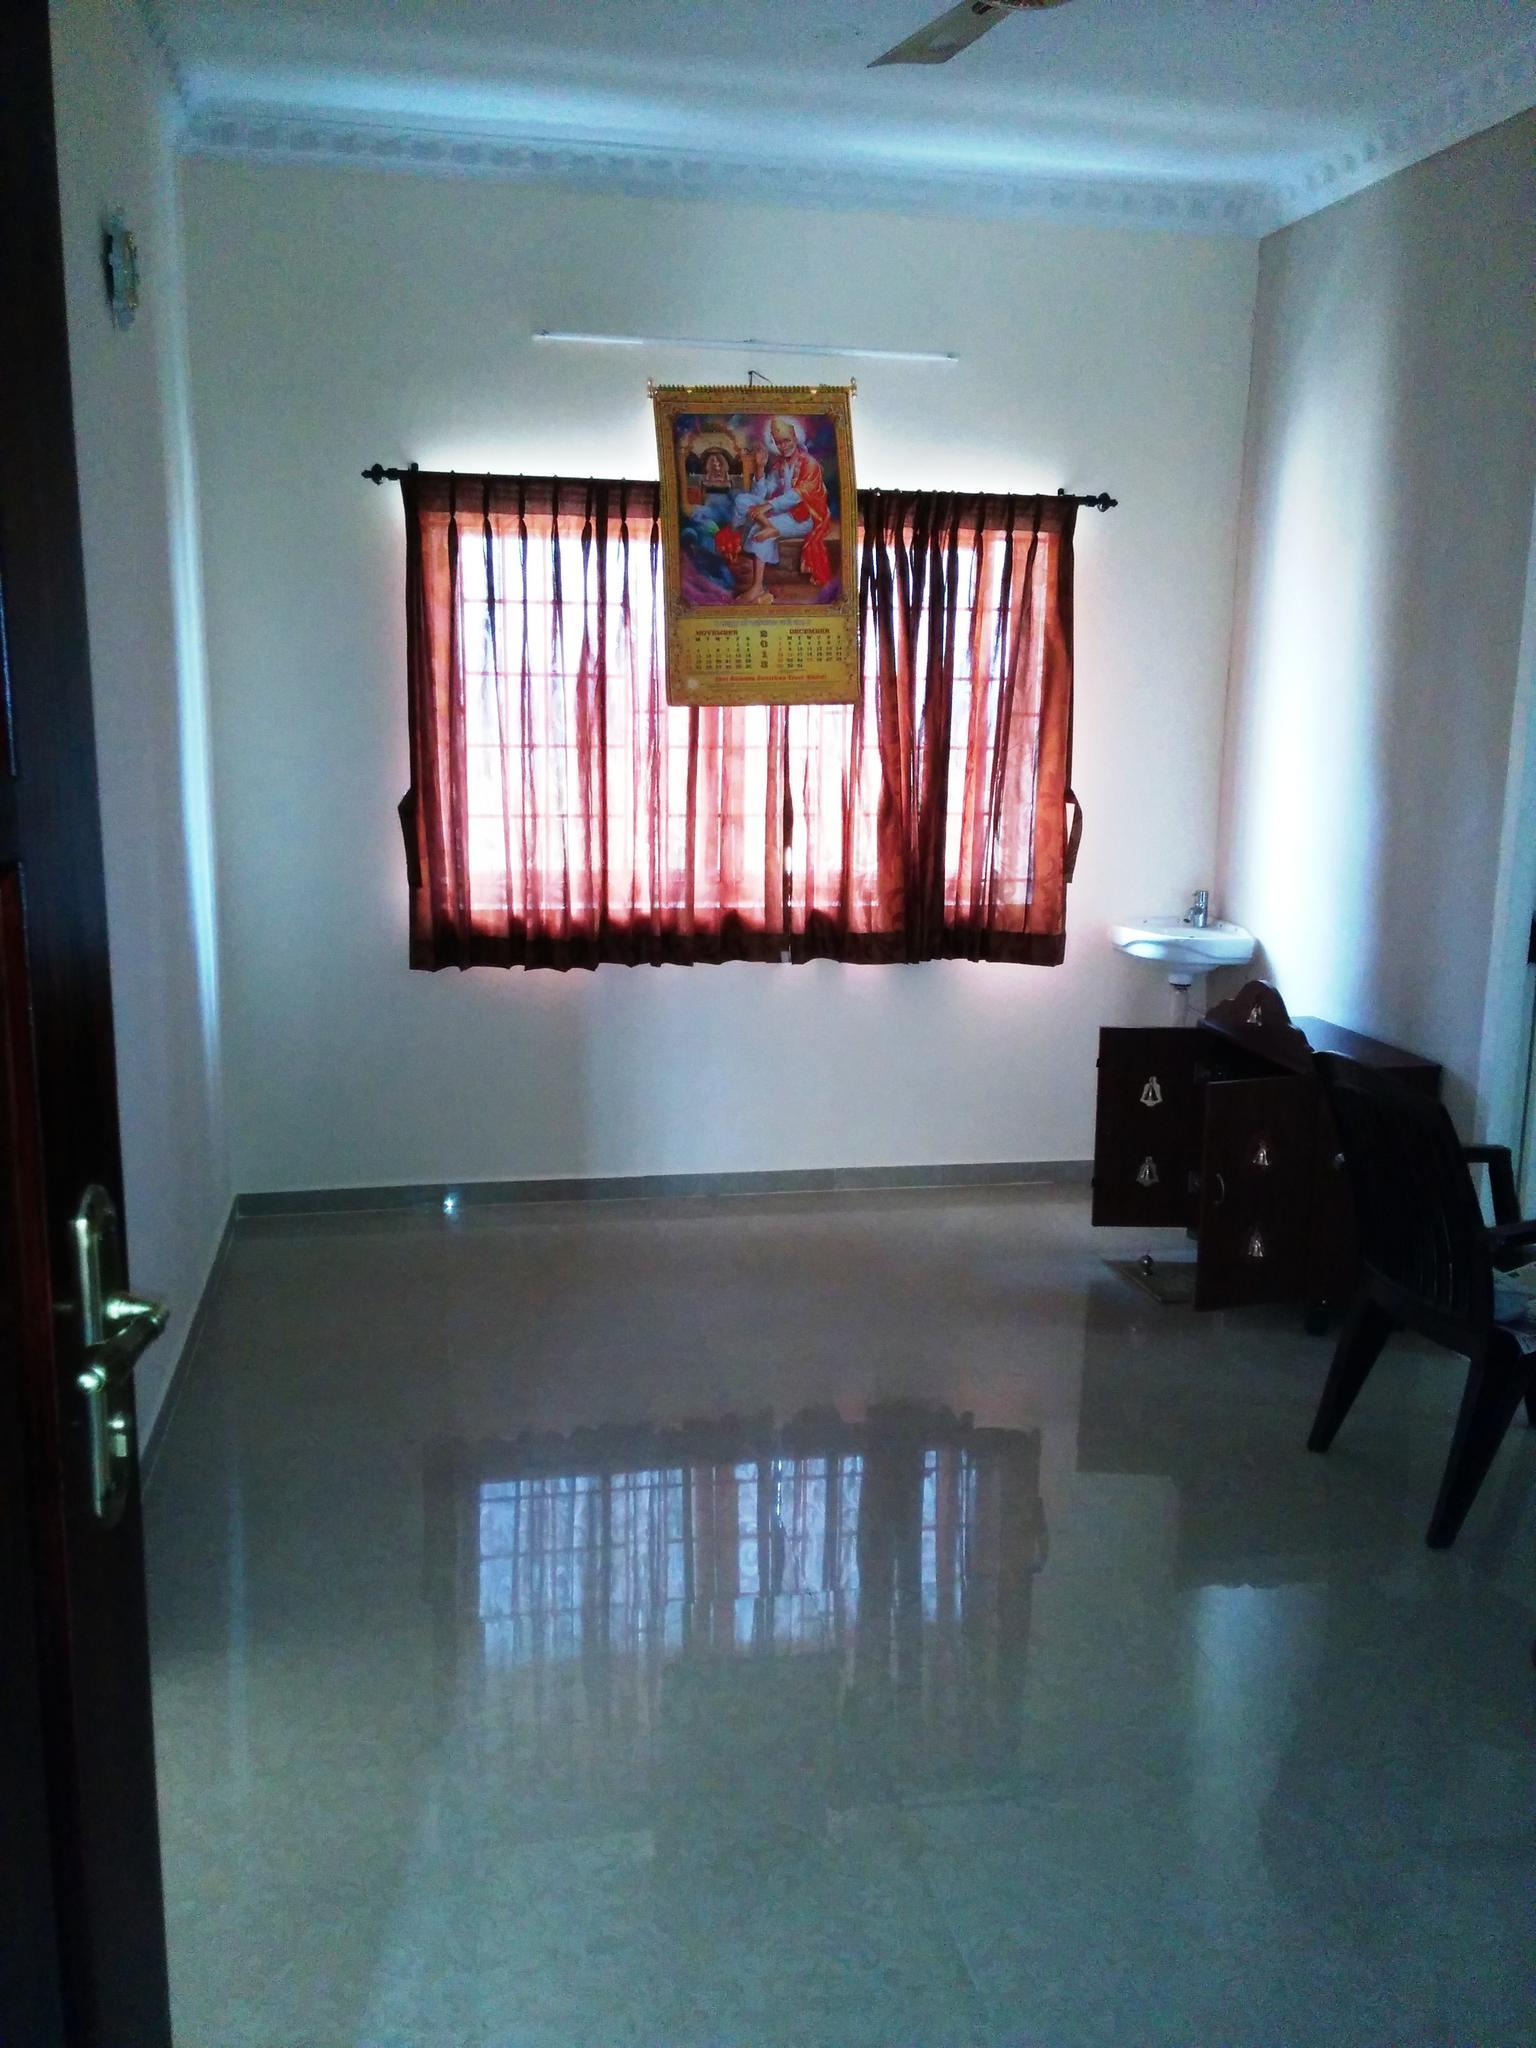 1560766530_banner_Coimbatore_5.jpeg